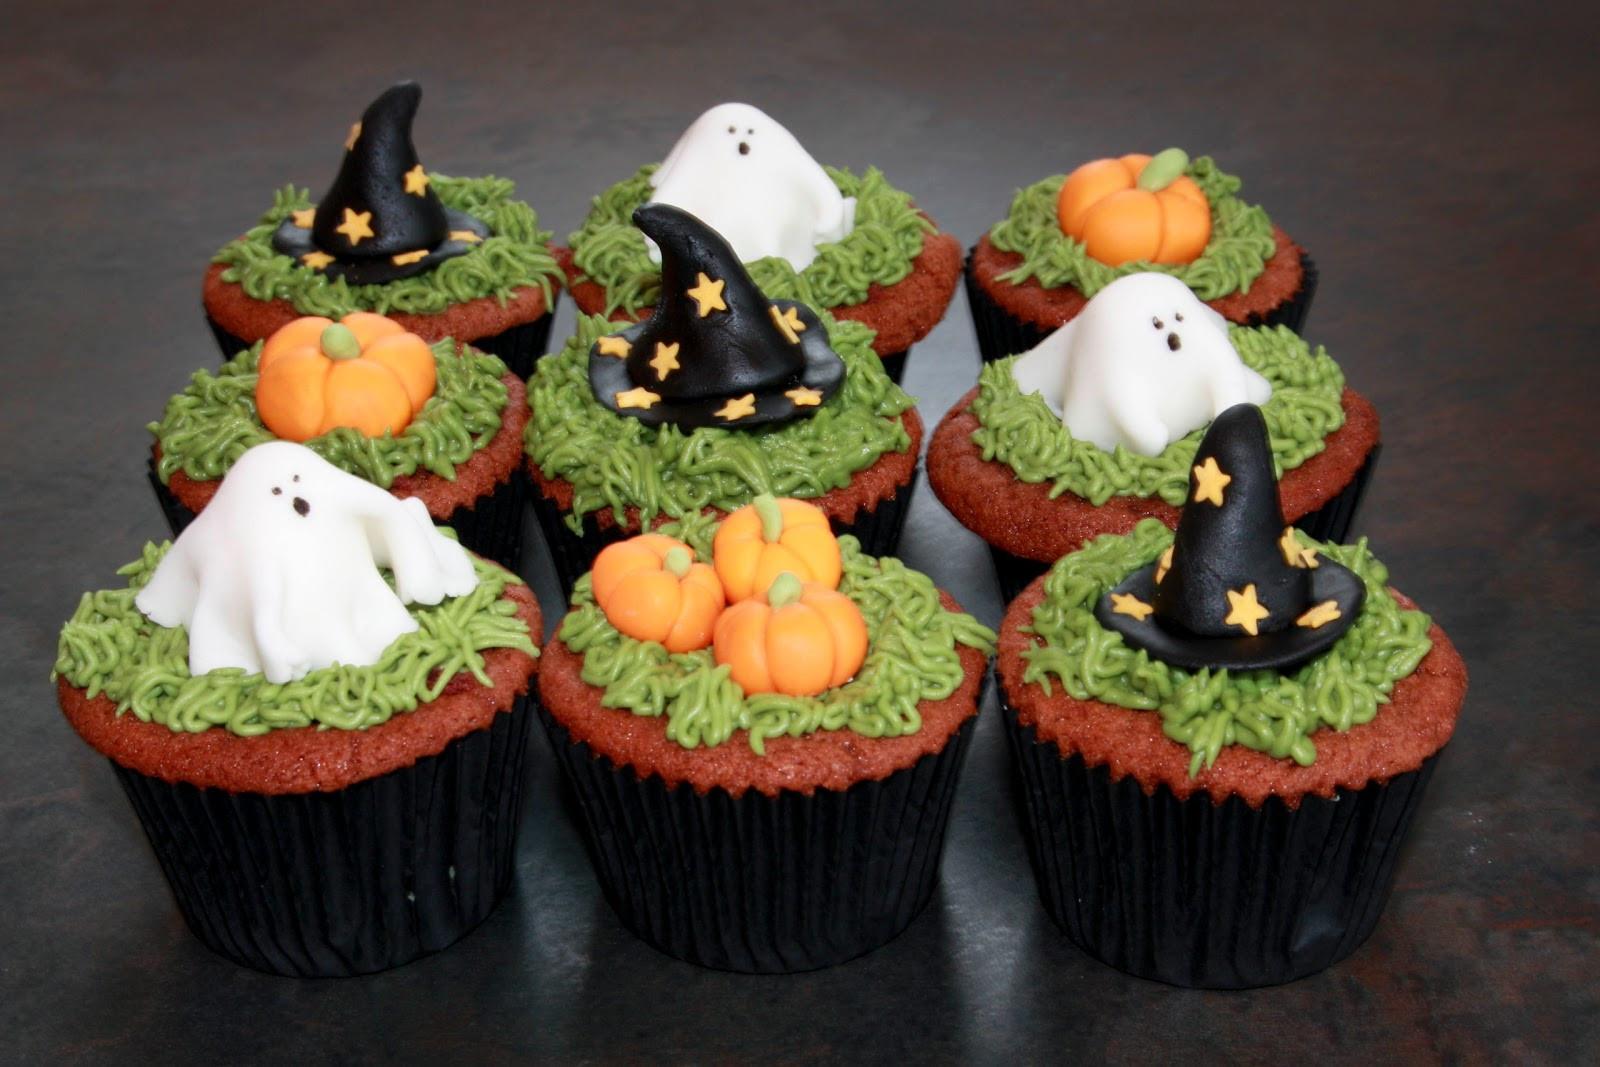 Halloween Cupcakes Cakes  The Cake Trail Halloween Red Velvet cupcakes